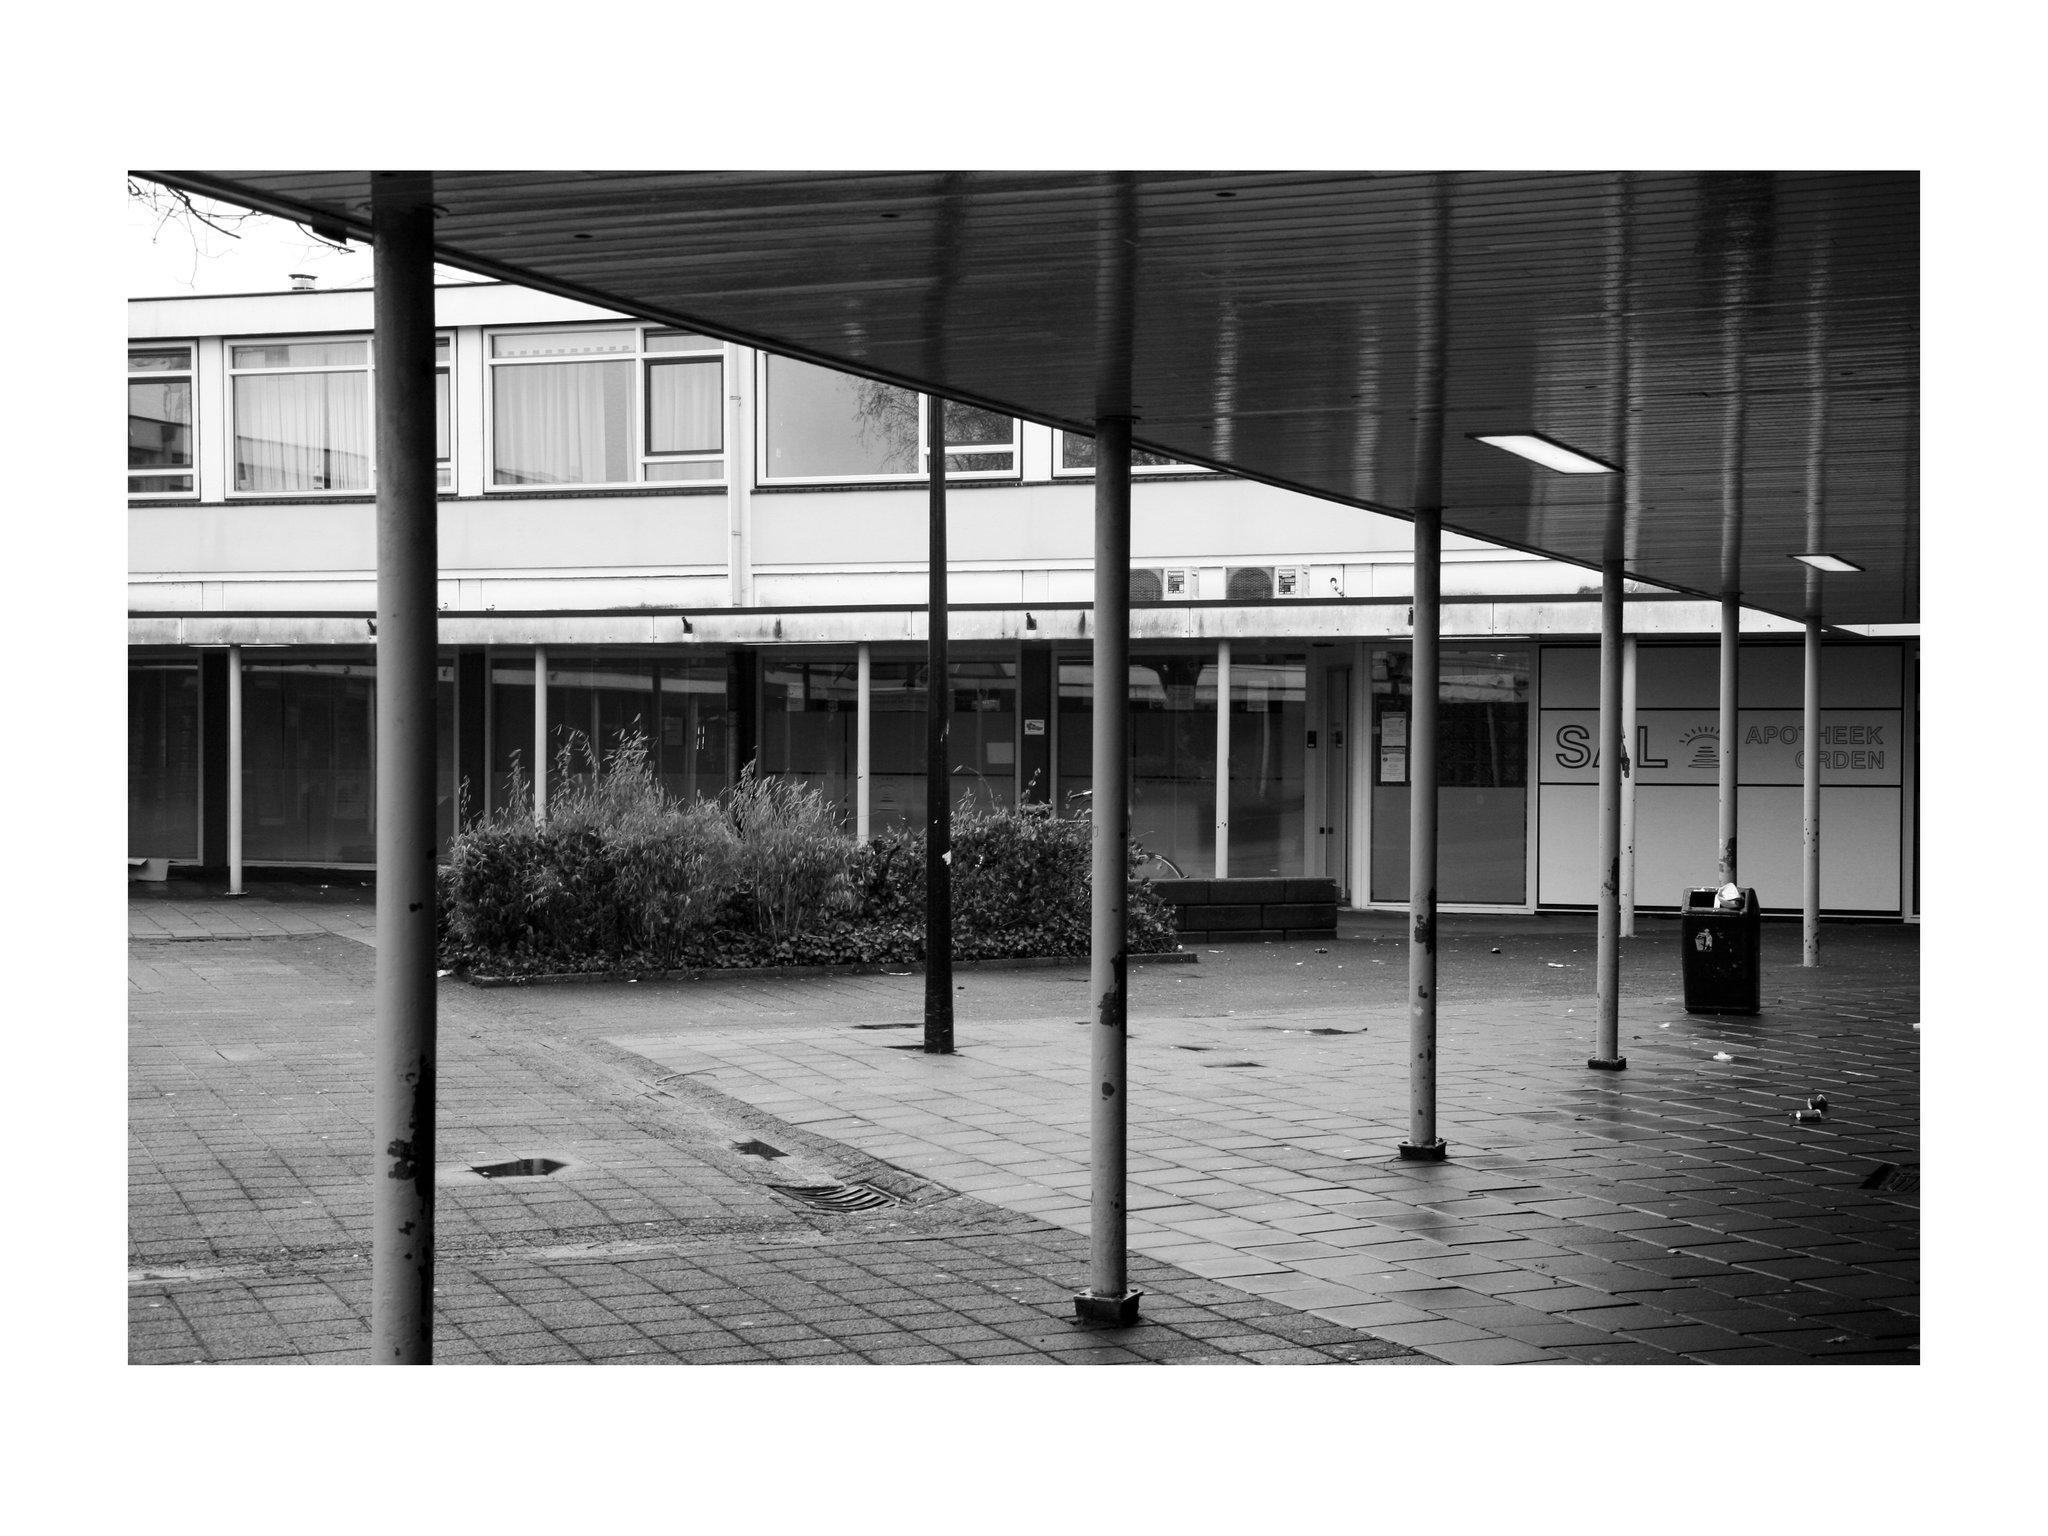 winkelplein (2008)